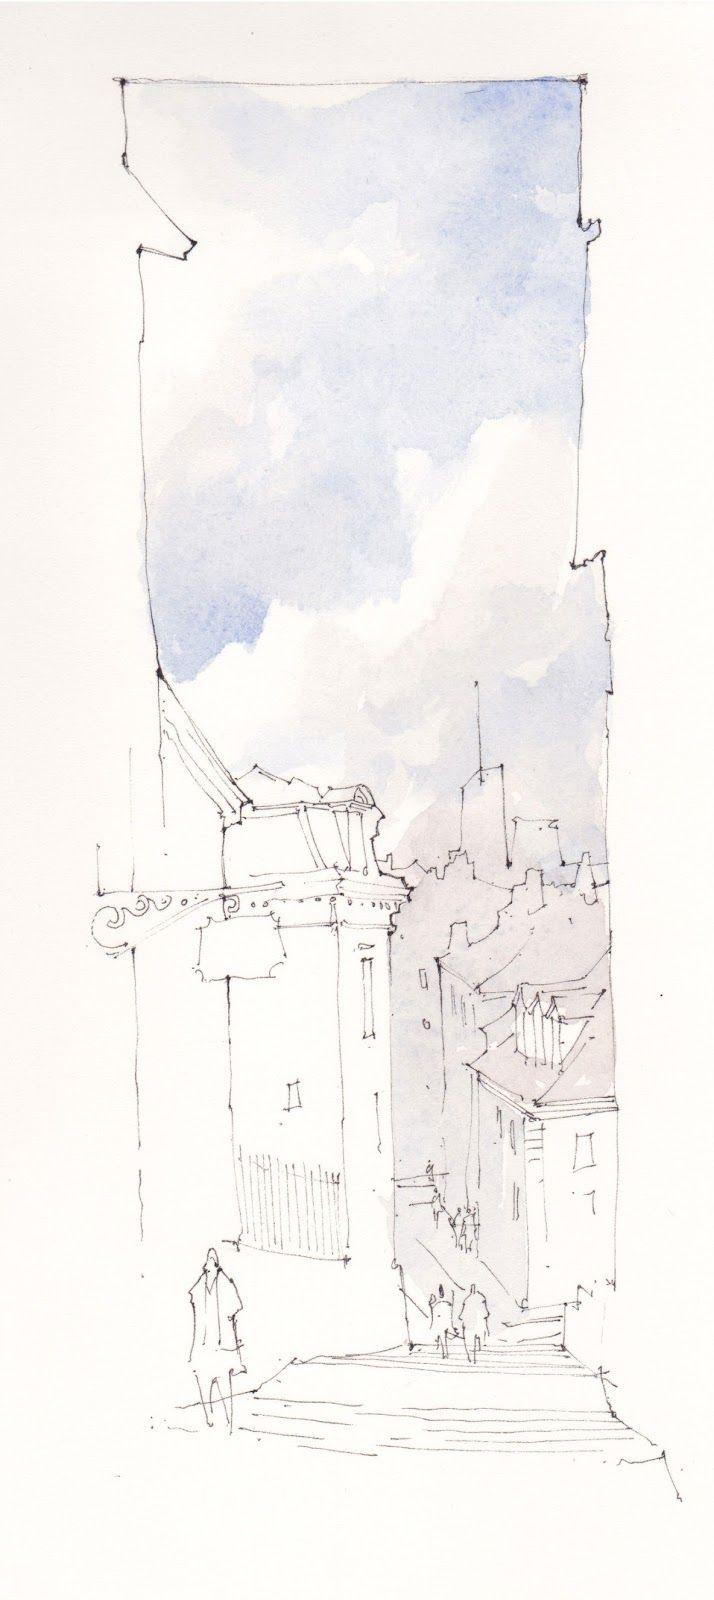 Pin On Urban Sketches